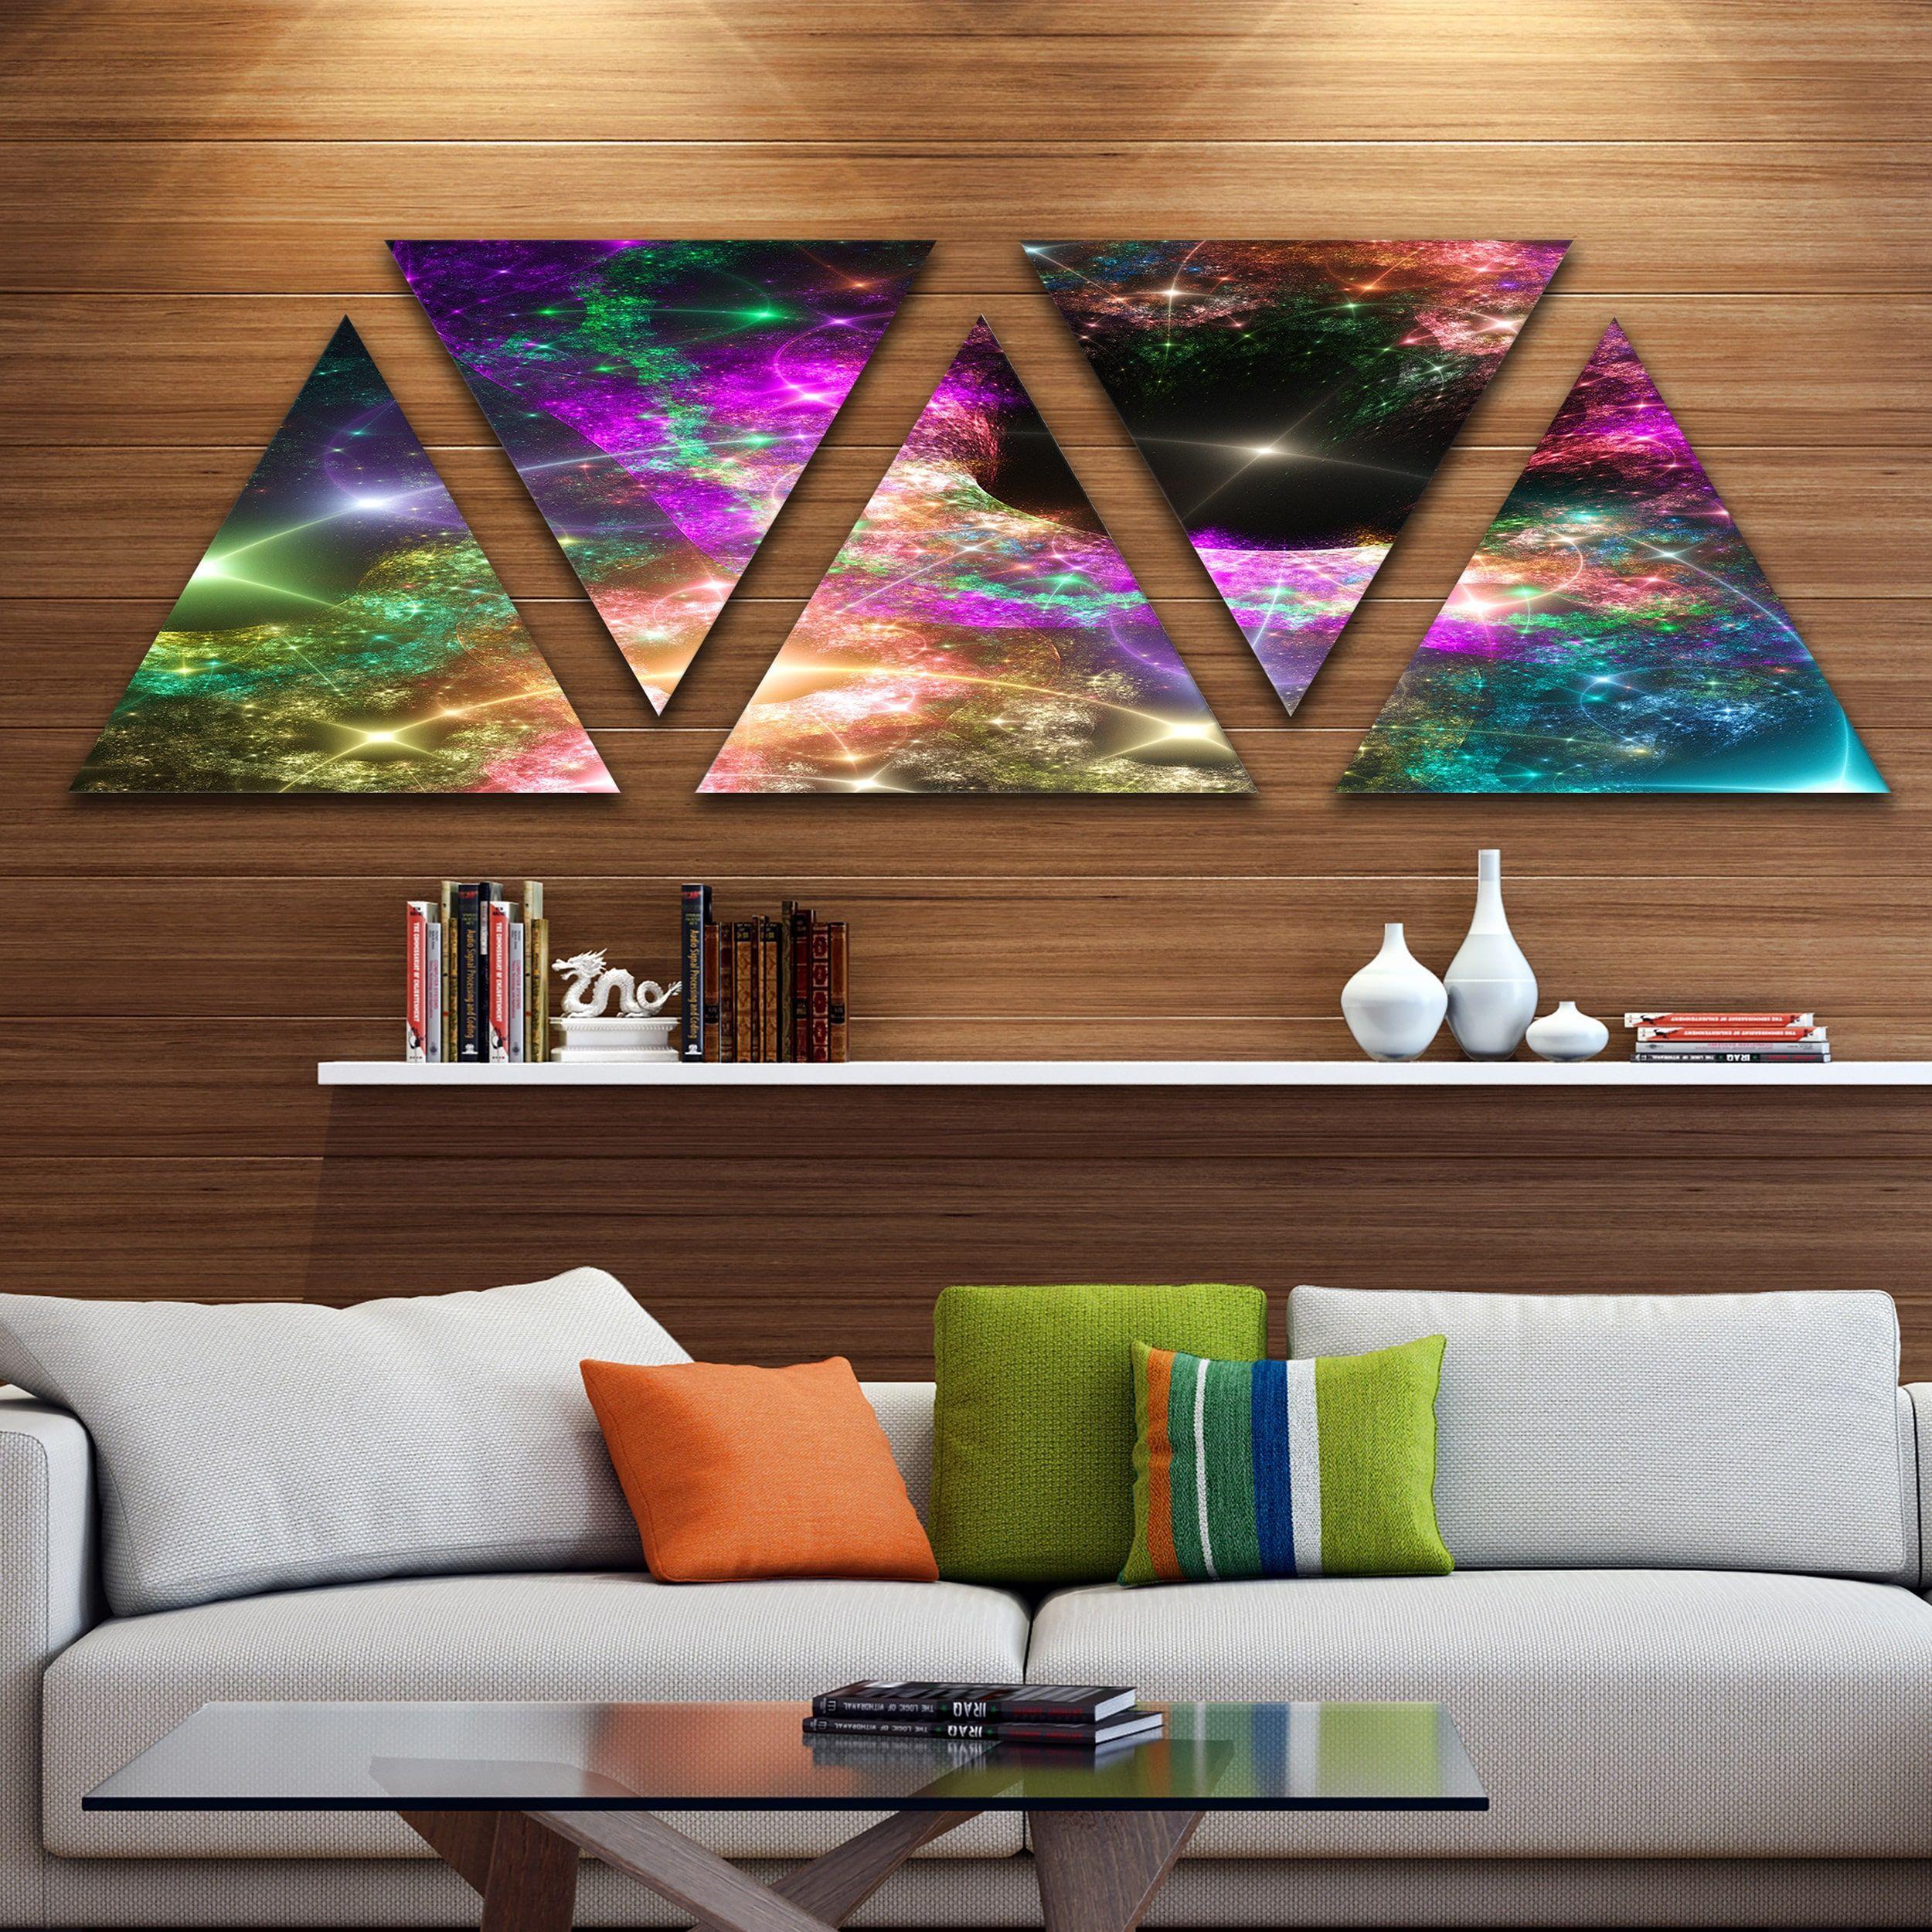 Designart 'Pink Cosmic Hole' Contemporary Art on Triangle Canvas - 5 Panels